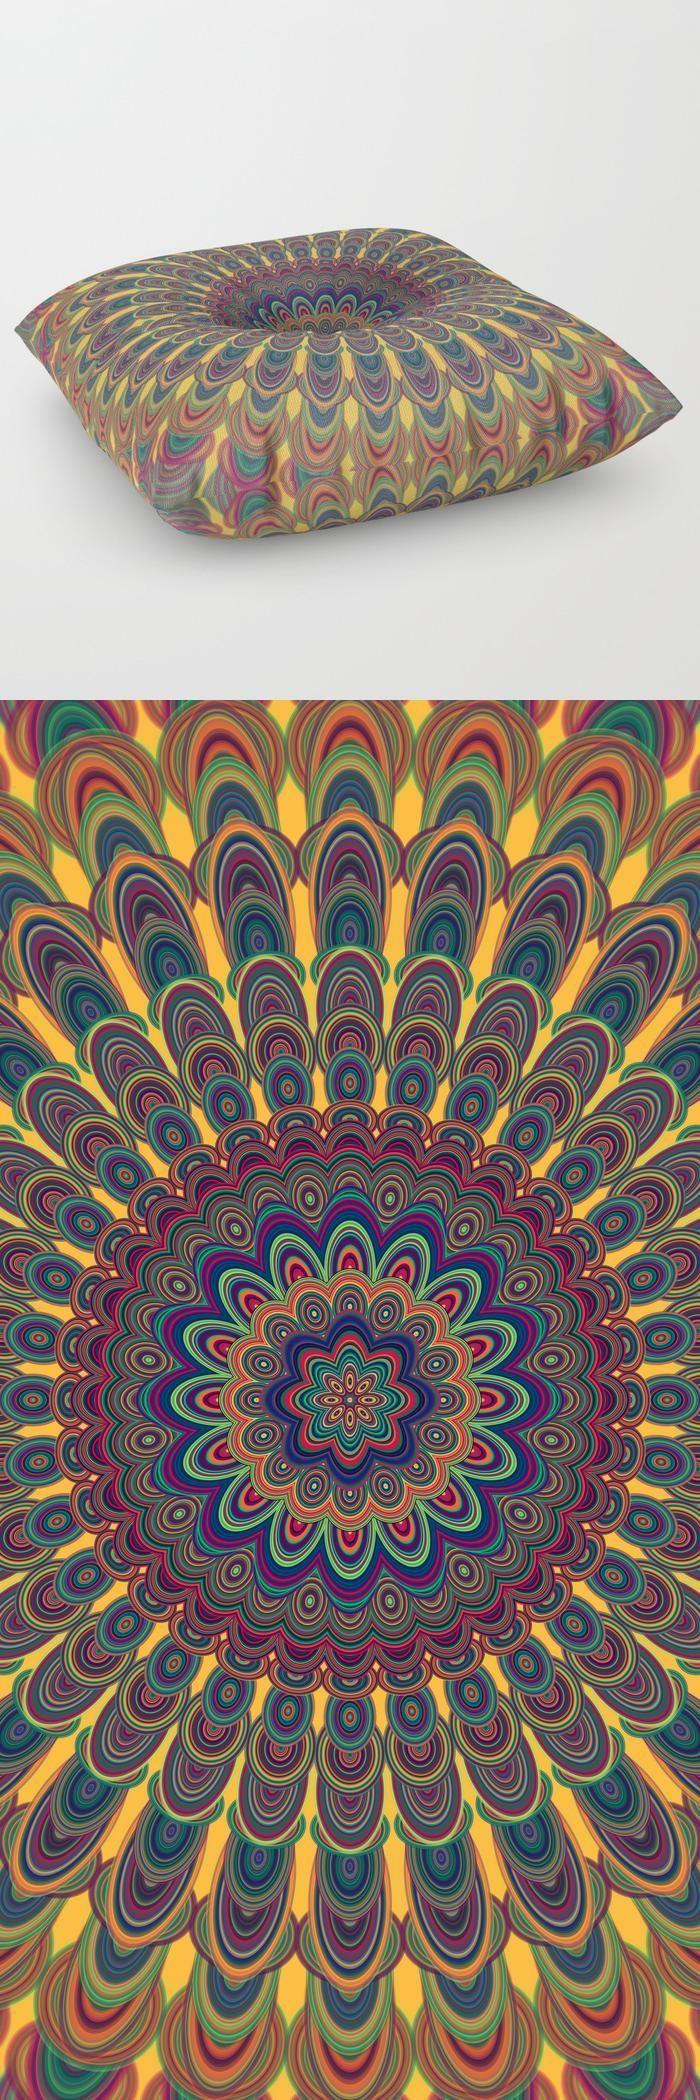 Bohemian Oval Mandala Floor Pillow by David Zydd | cozy bohemian bedroom floor pillows #MandalaPillow #mandala #floorpillow #pillow #cushioncover #throwpillows #room #homedecorideas #home #bohochic #bohemian #flowers #floralmandala #abstract #gift #xmas